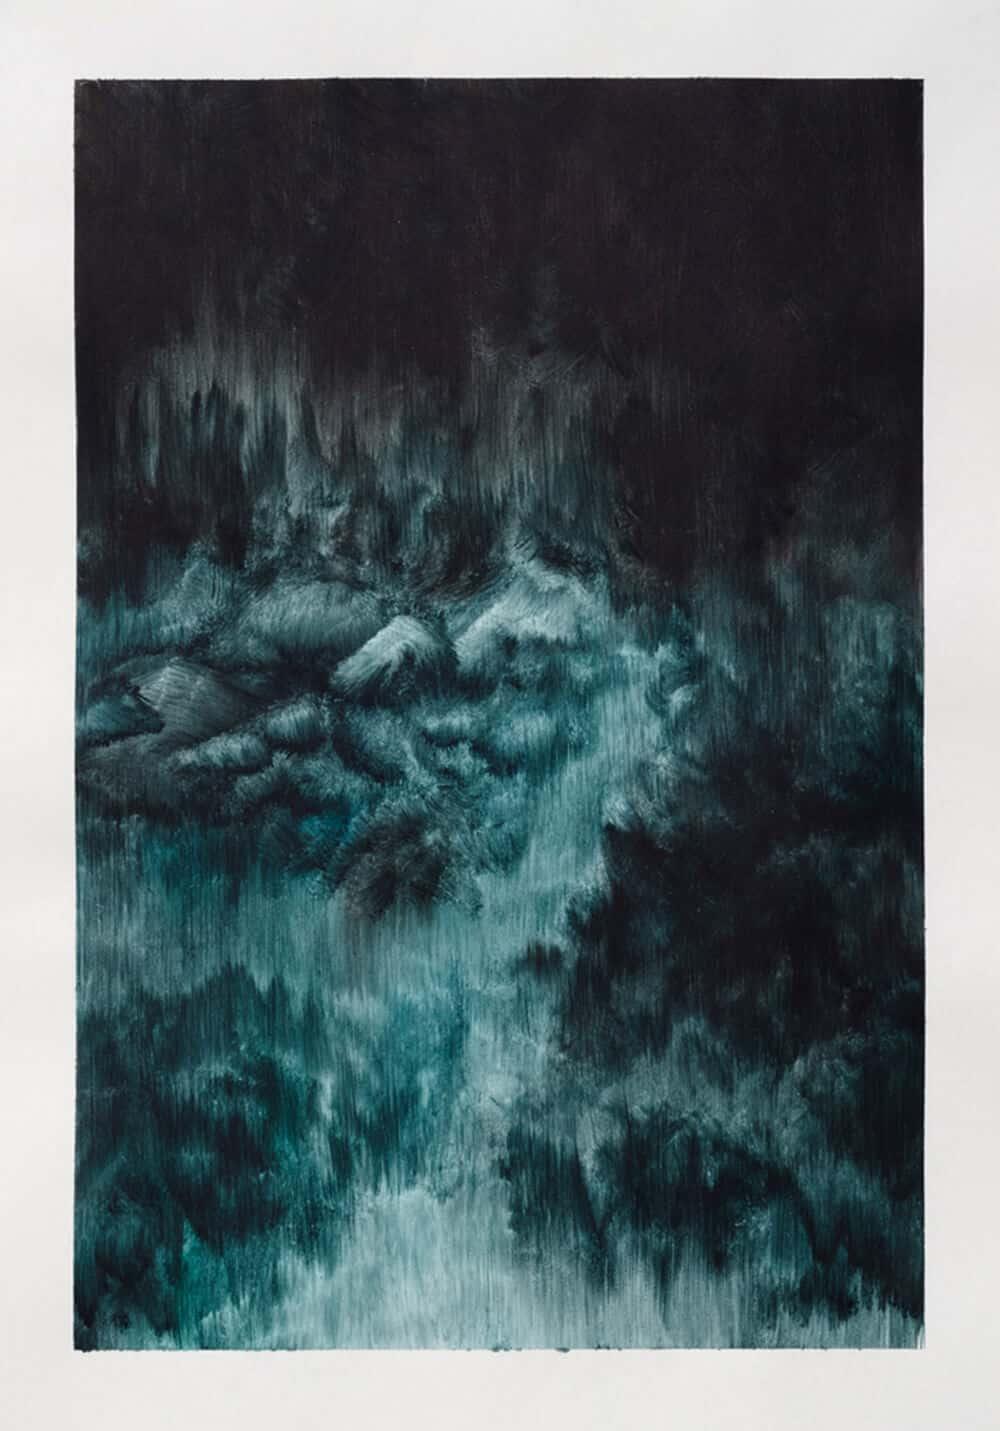 ZARAH CASSIM. Fall Into, 2017. Oil on paper. 350 x 265mm. Framed